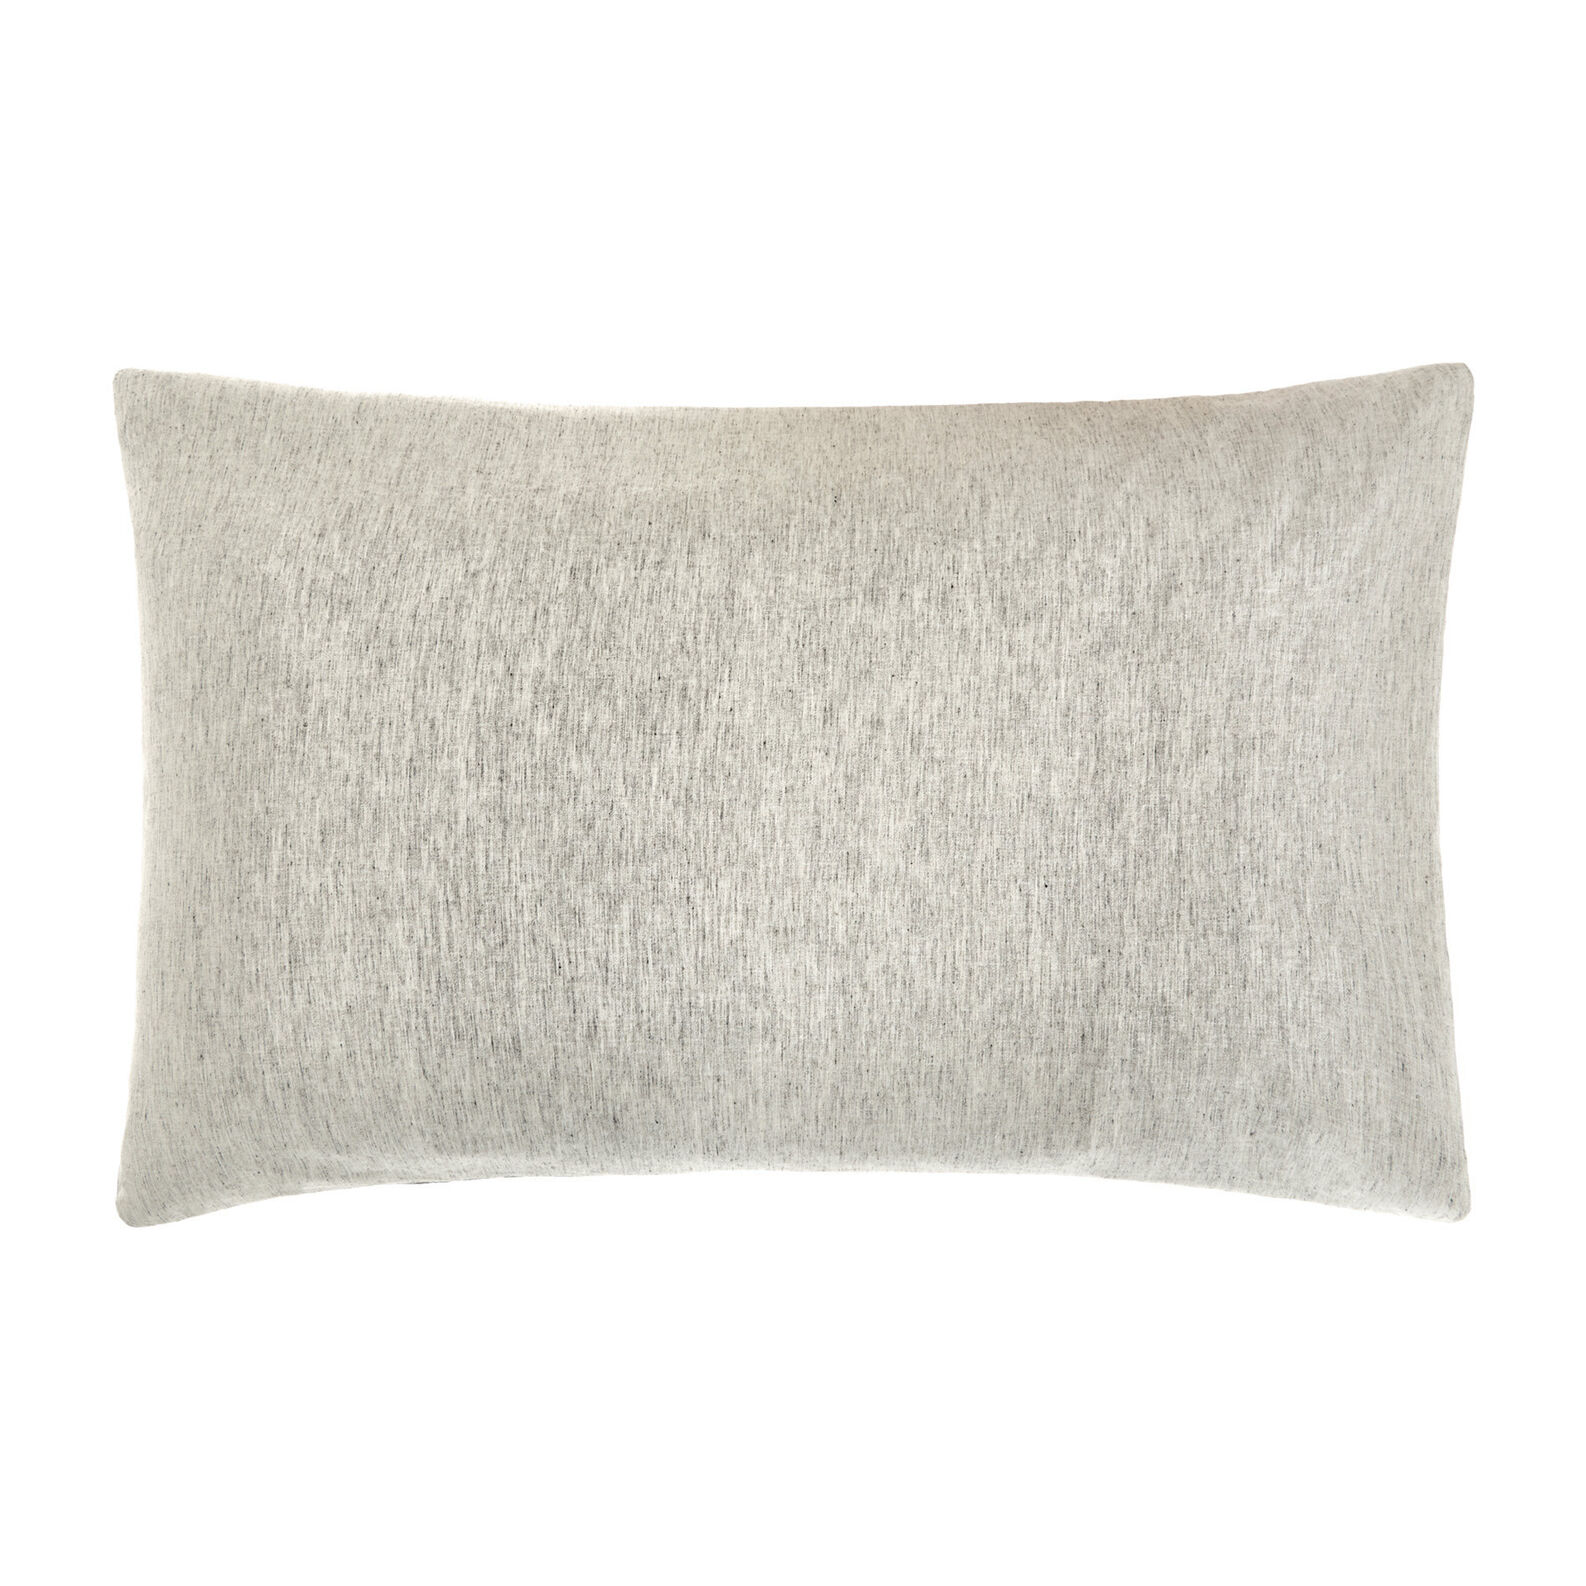 Mélange-effect washed linen blend pillowcase